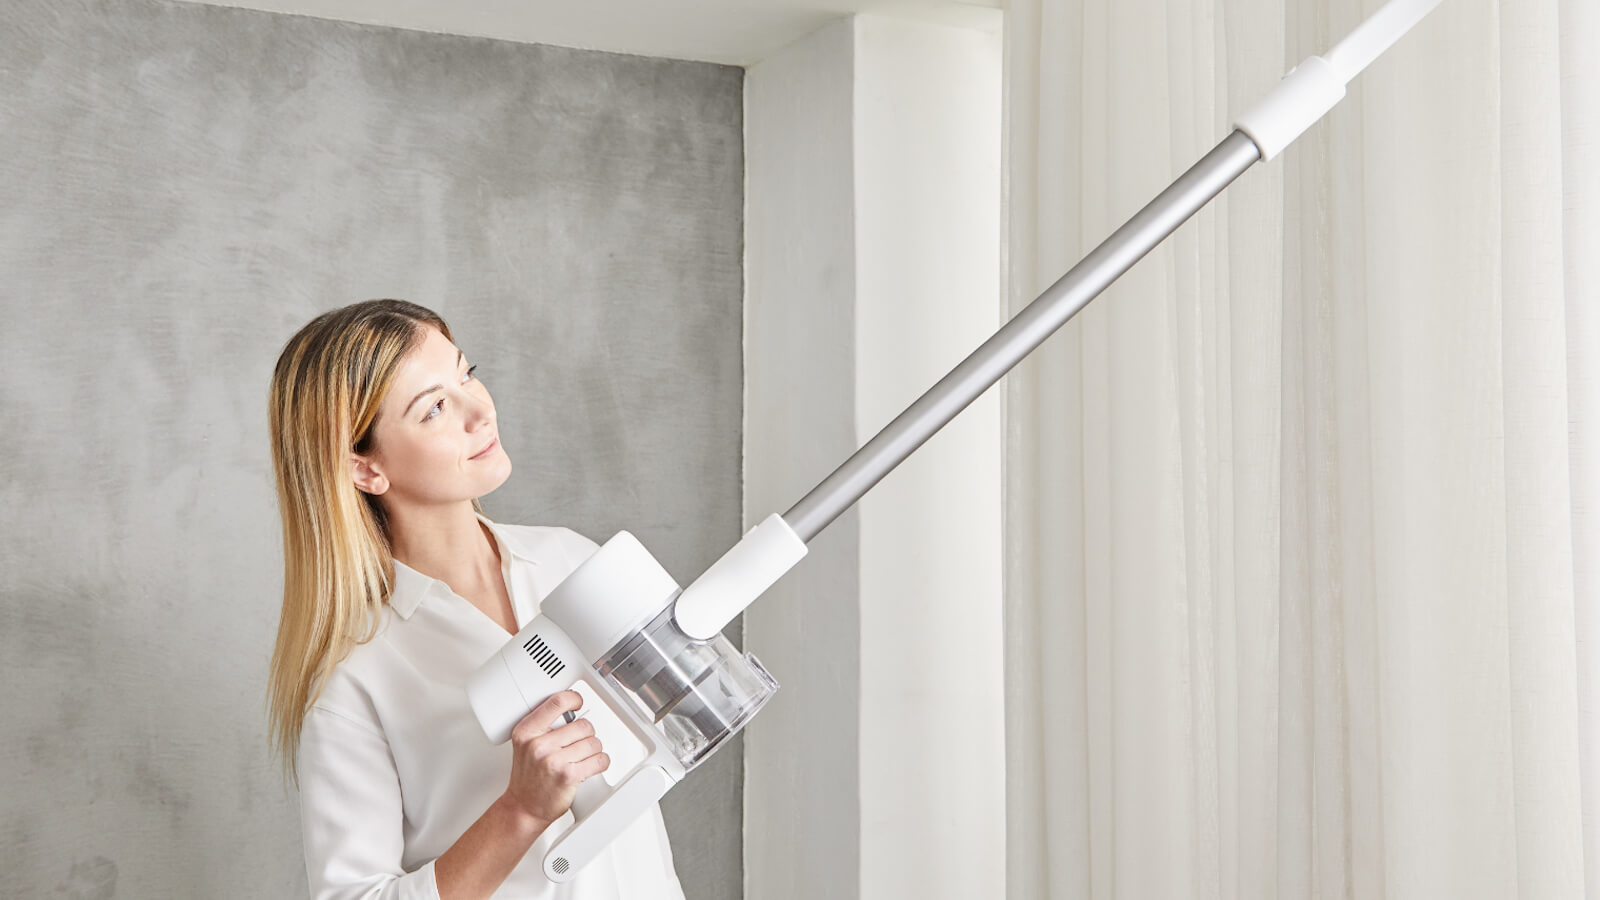 Dream-Tech-T10-cordless-stick-vacuum-cleaner-001.jpg